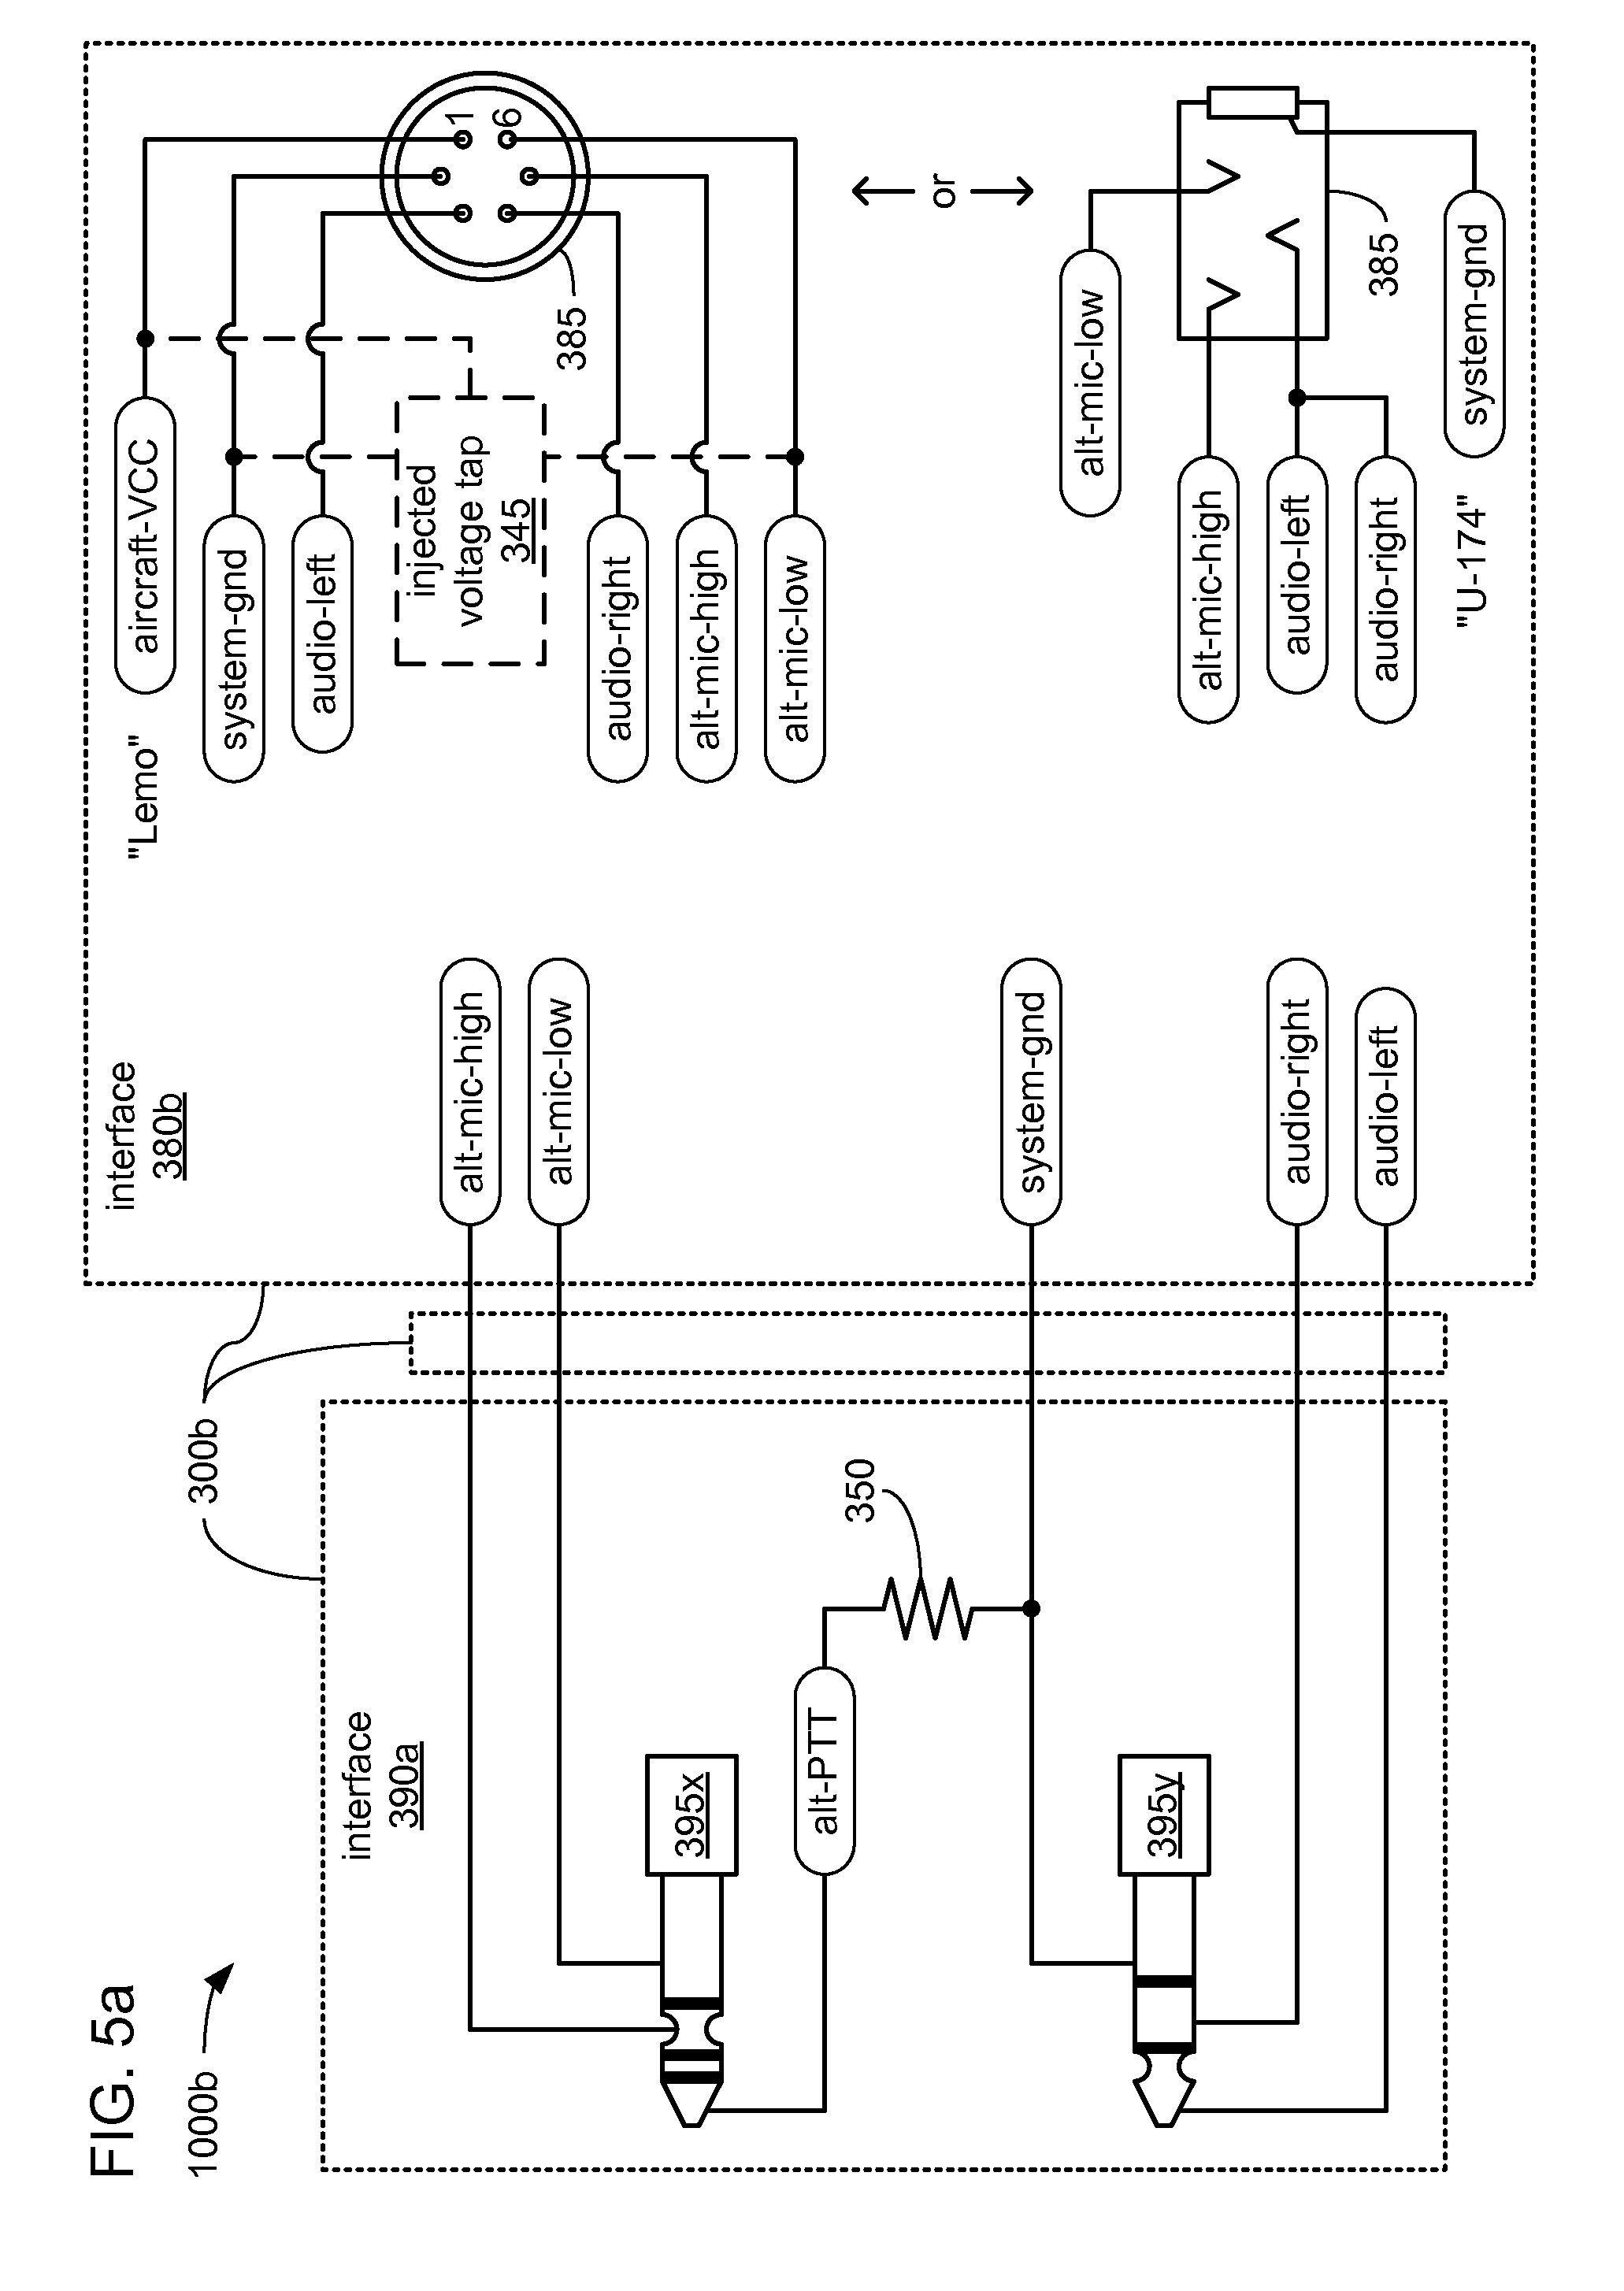 New Wiring Diagram Headphone Jack Diagram Headphone Wire